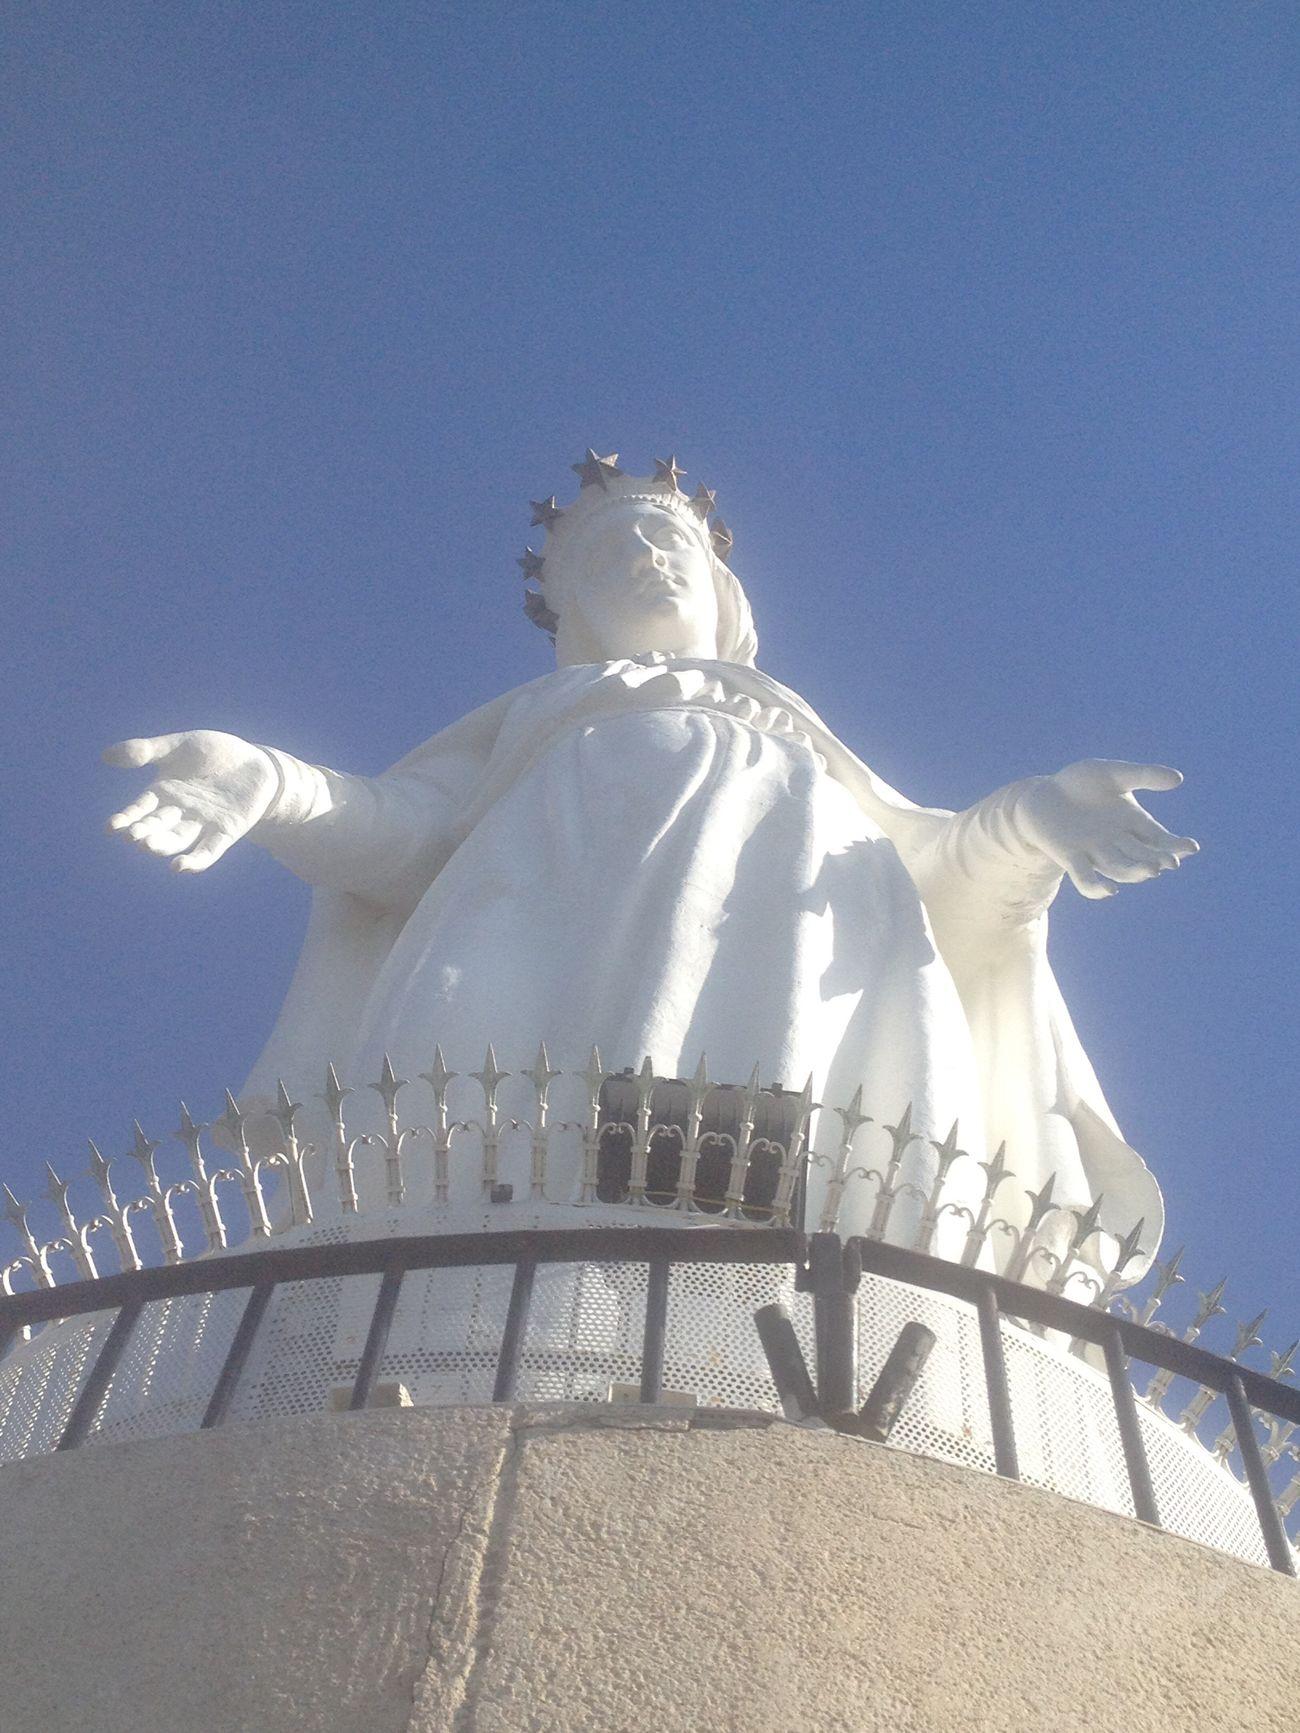 Ourladyoflebanon MyLebanon Worshipping Worshiping God Worship Low Angle View No People Day Sky EyeEmNewHere